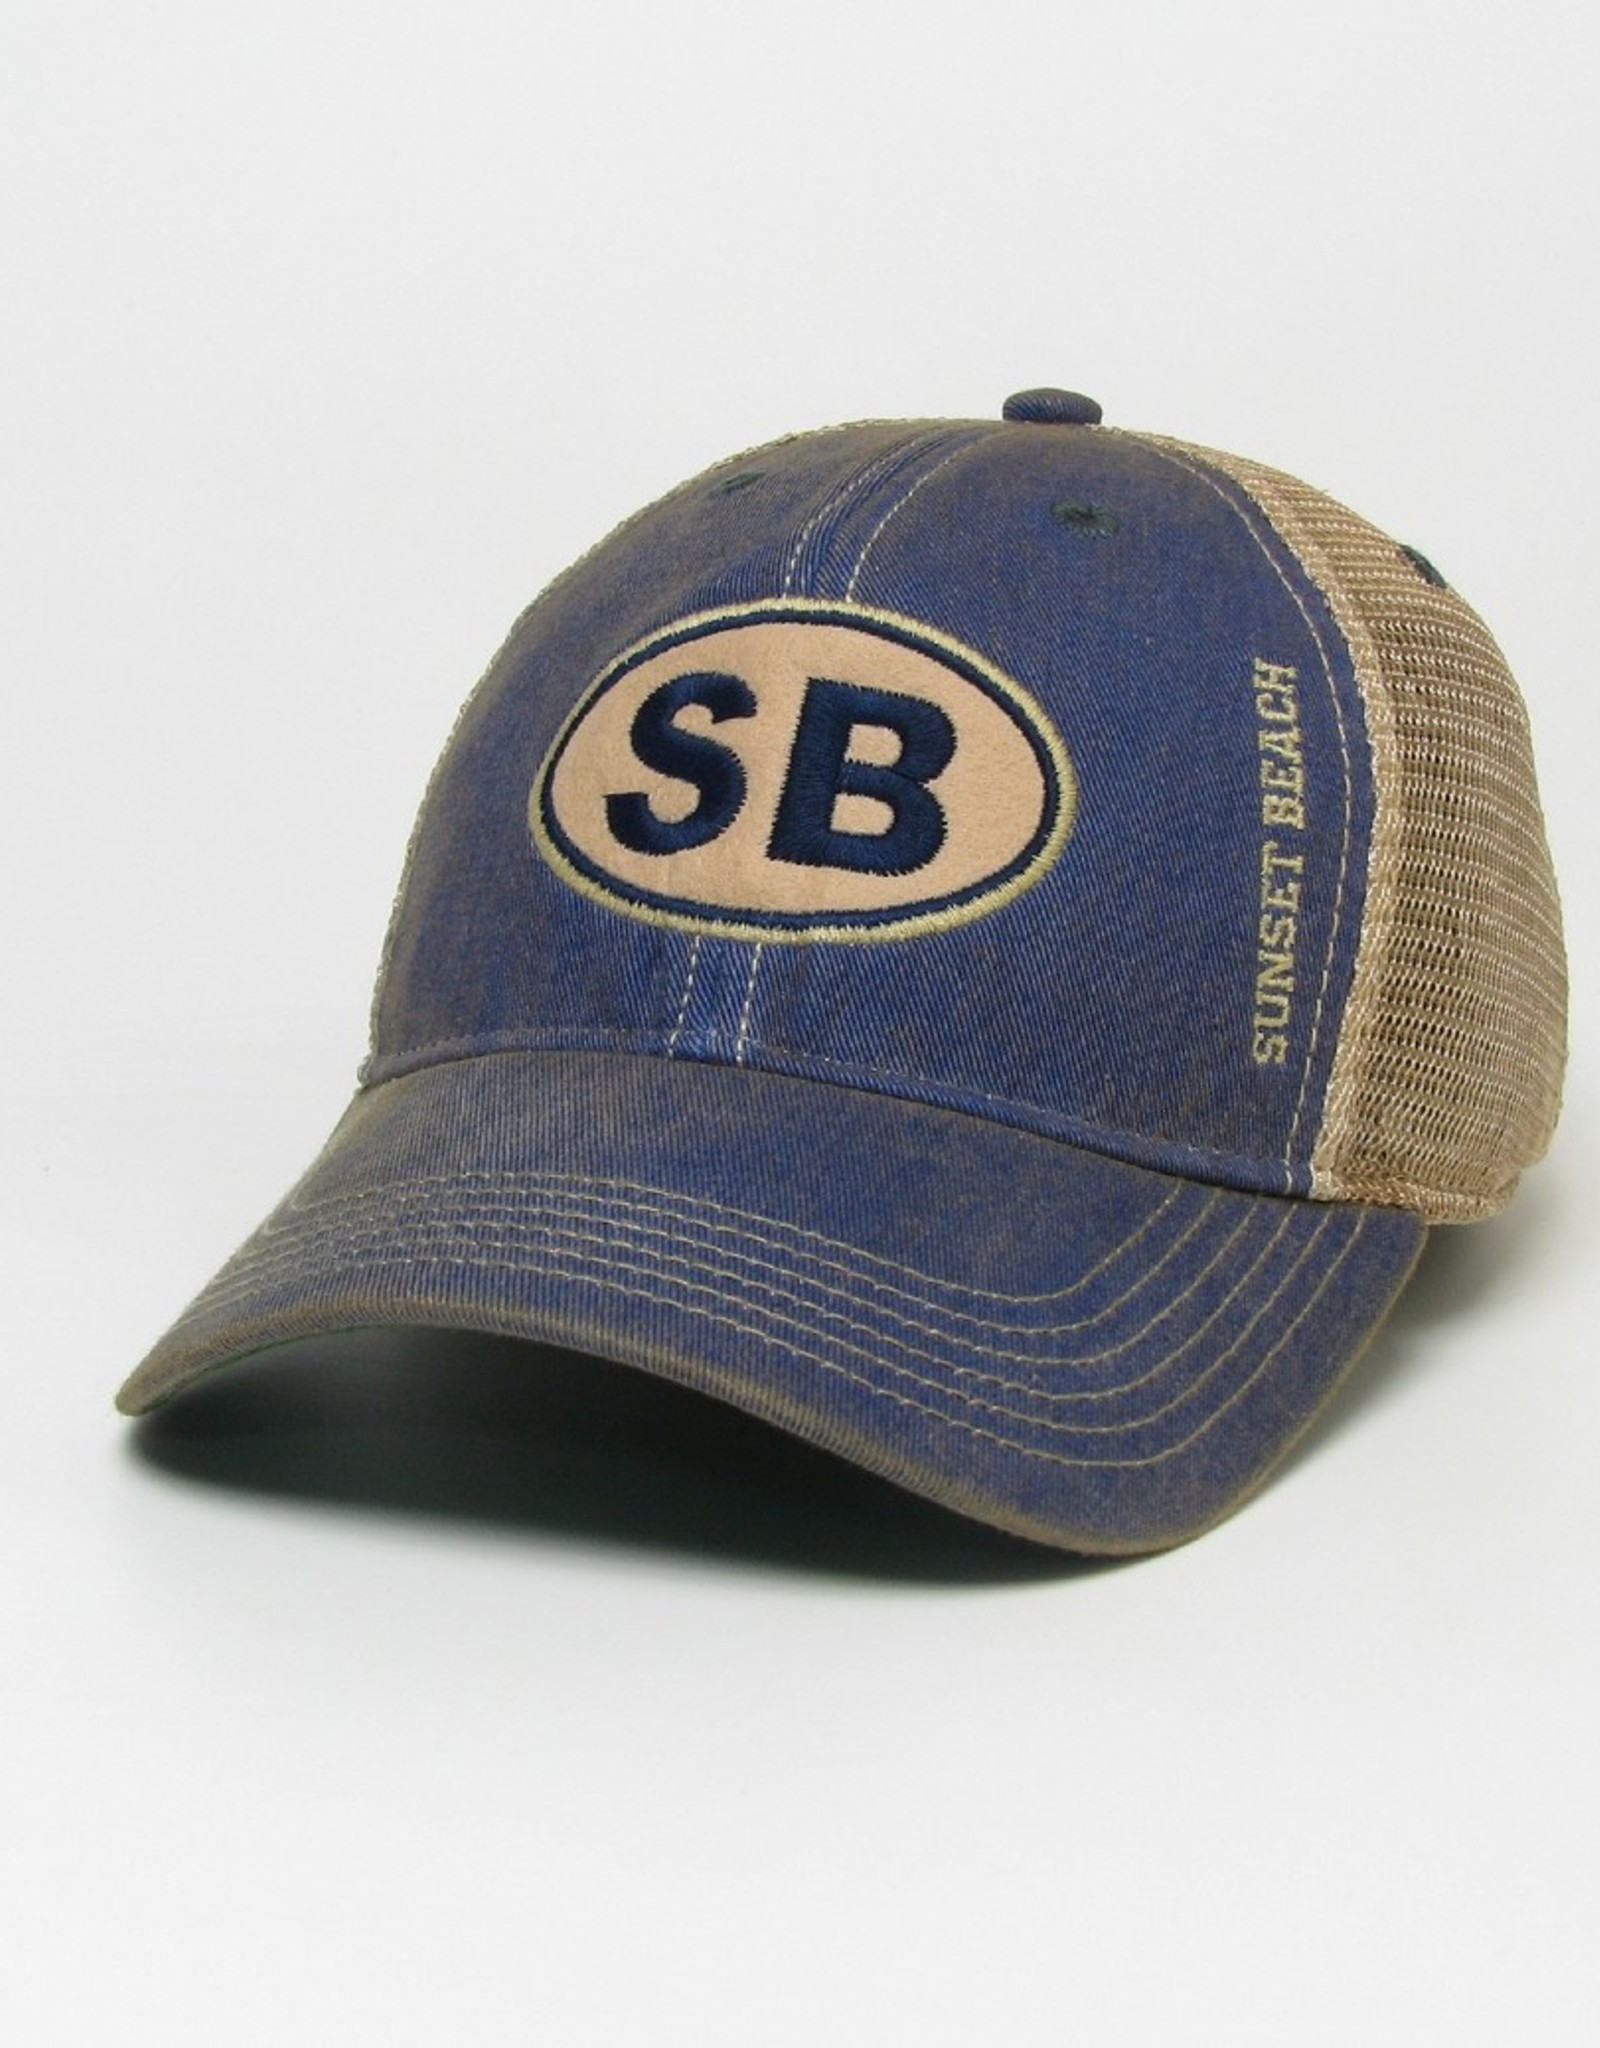 SB EURO OFY TRUCKER CAP BLUE